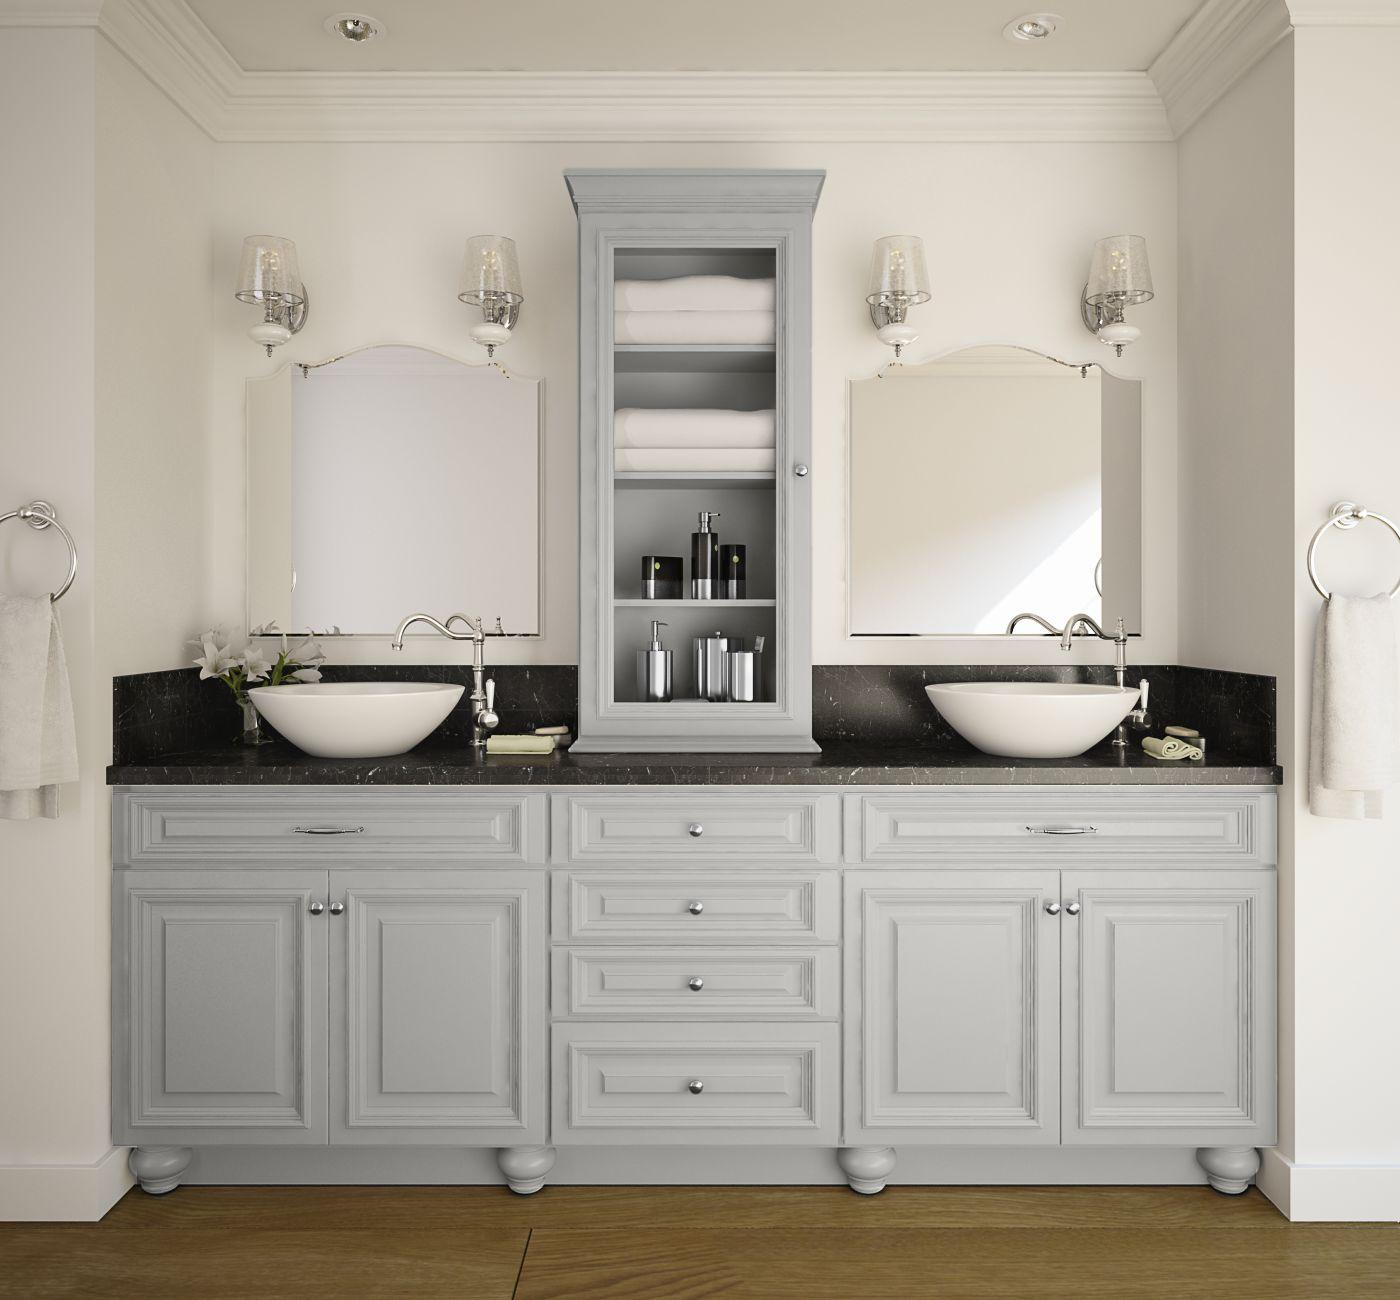 Already Assembled Kitchen Cabinets: Roosevelt Dove Gray Pre-Assembled Kitchen Cabinets